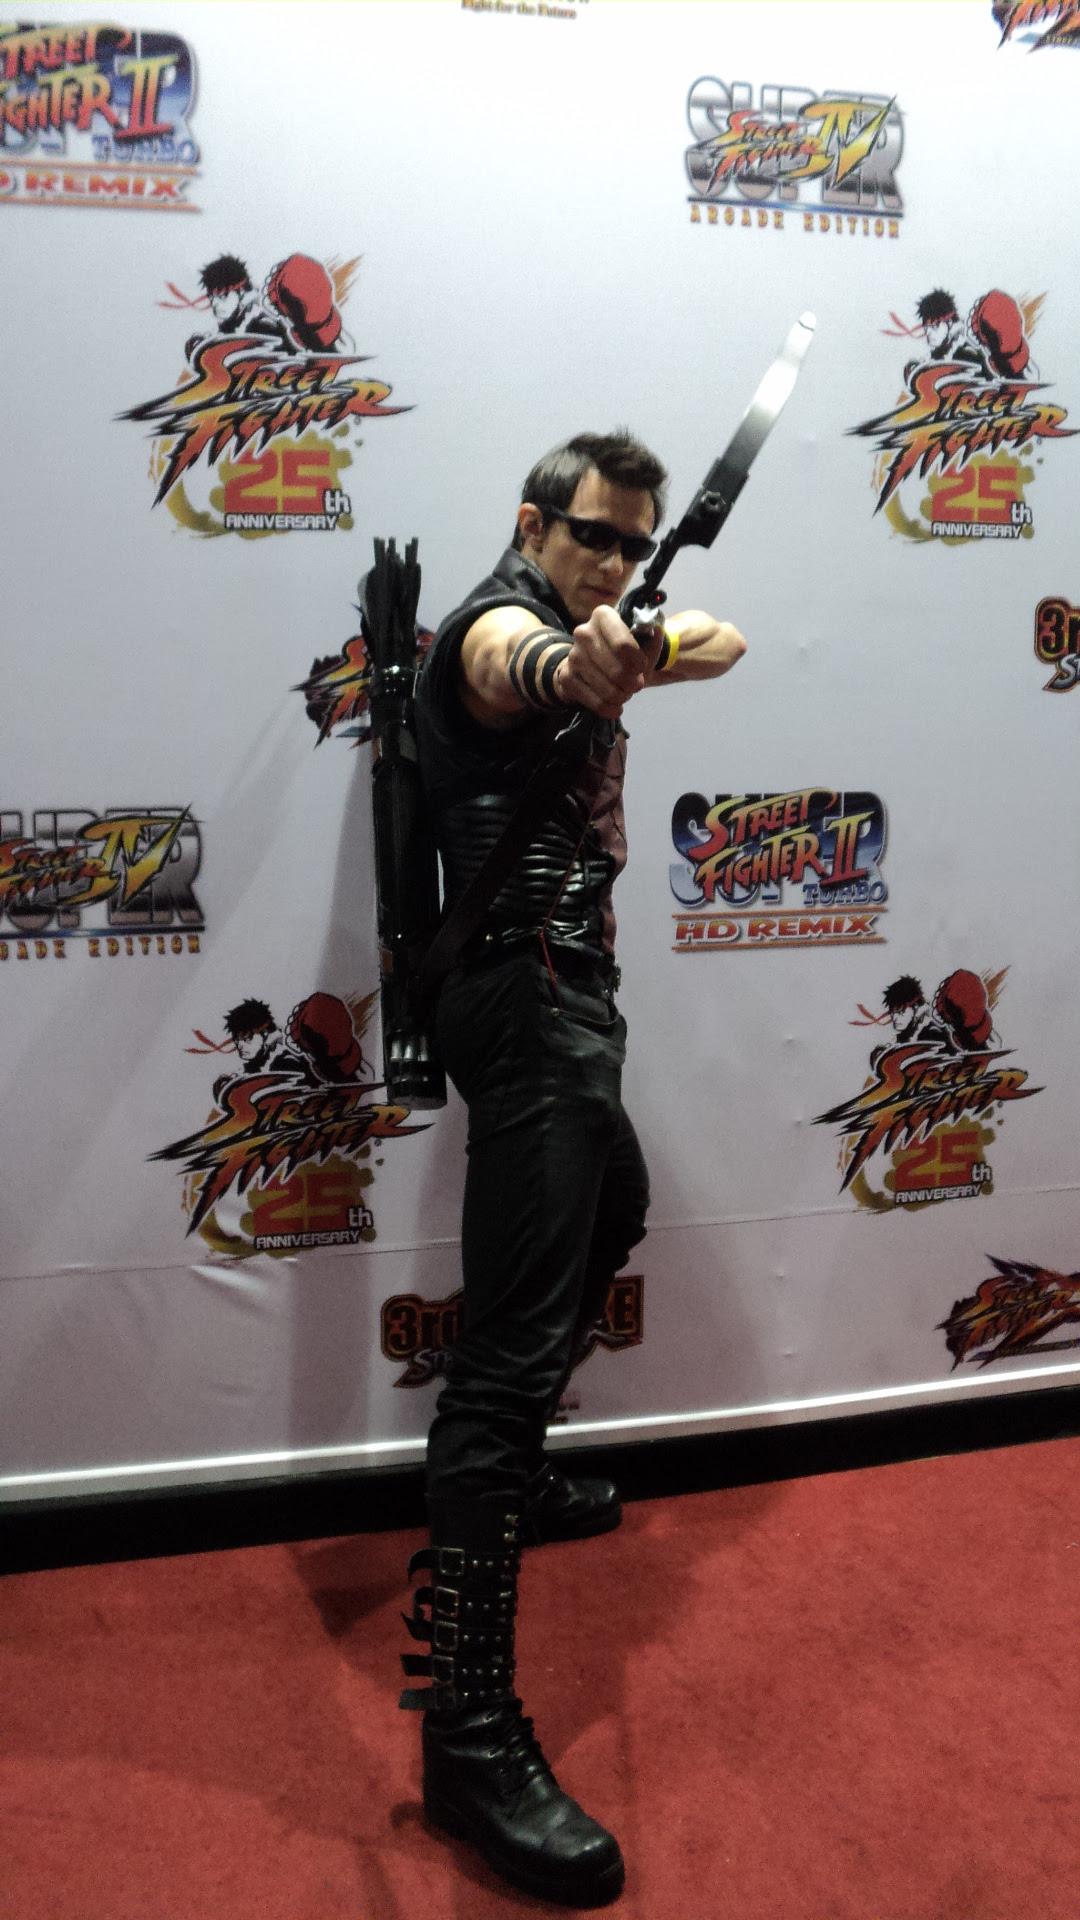 http://fc09.deviantart.net/fs70/f/2012/305/2/c/hawkeye___the_avengers___edu_kiss___cosplay_by_edukiss-d5jp2ys.jpg